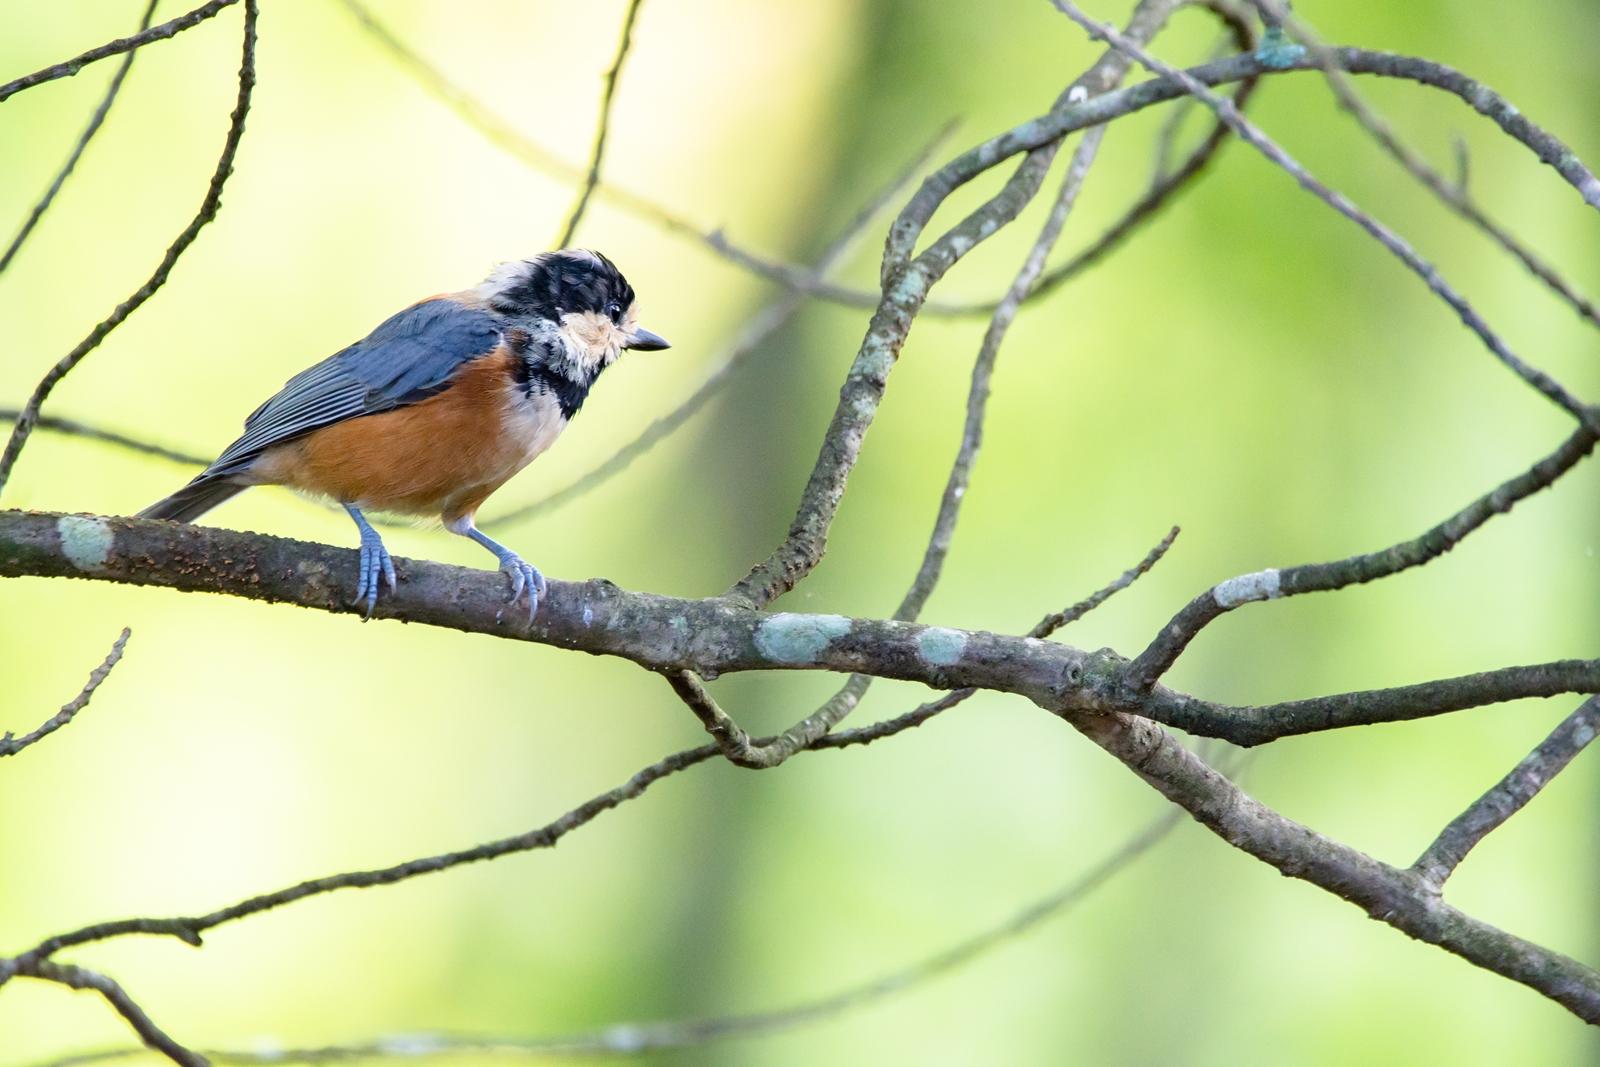 Photo: 呼ぶ声 Calling.  何かが呼んでいる 実りを控える木の実の声 去りゆく緑の声 次に訪れる季節の声  Varied tit. (ヤマガラ)  #birdphotography #birds #cooljapan #kawaii #nikon #sigma  Nikon D7200 SIGMA 150-600mm F5-6.3 DG OS HSM Contemporary